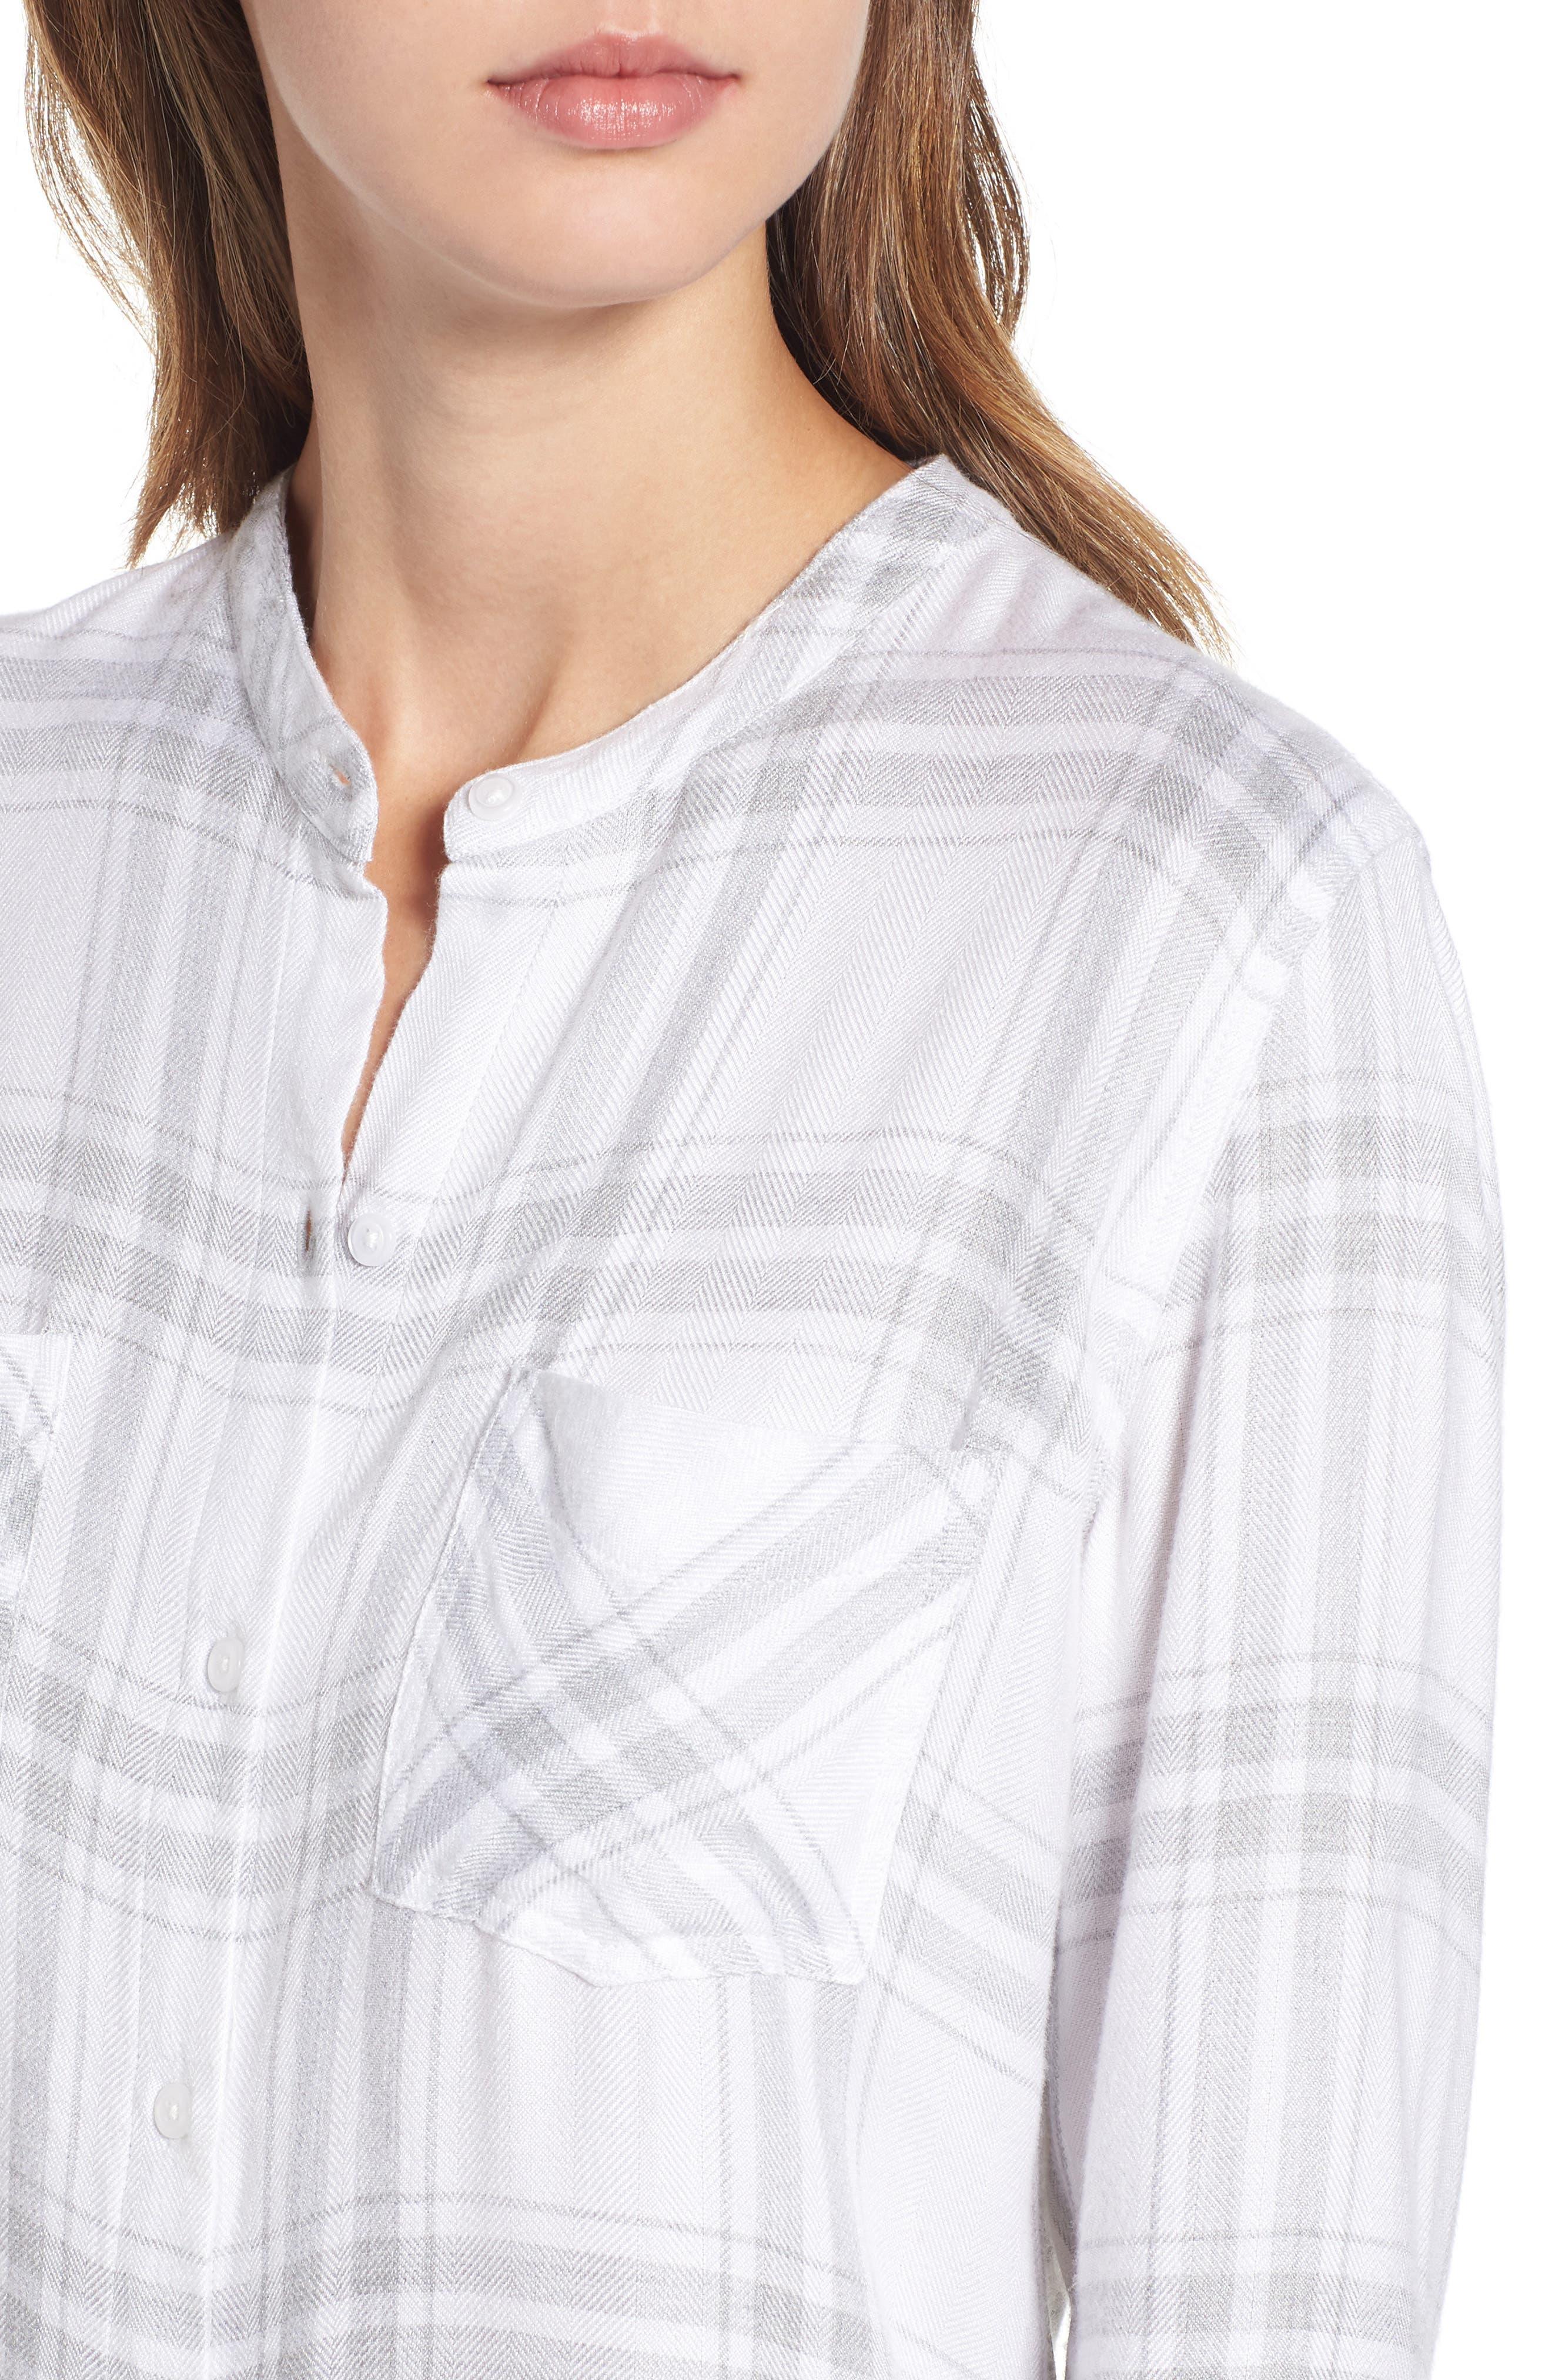 Allison Plaid Shirt,                             Alternate thumbnail 4, color,                             WHITE SILVER